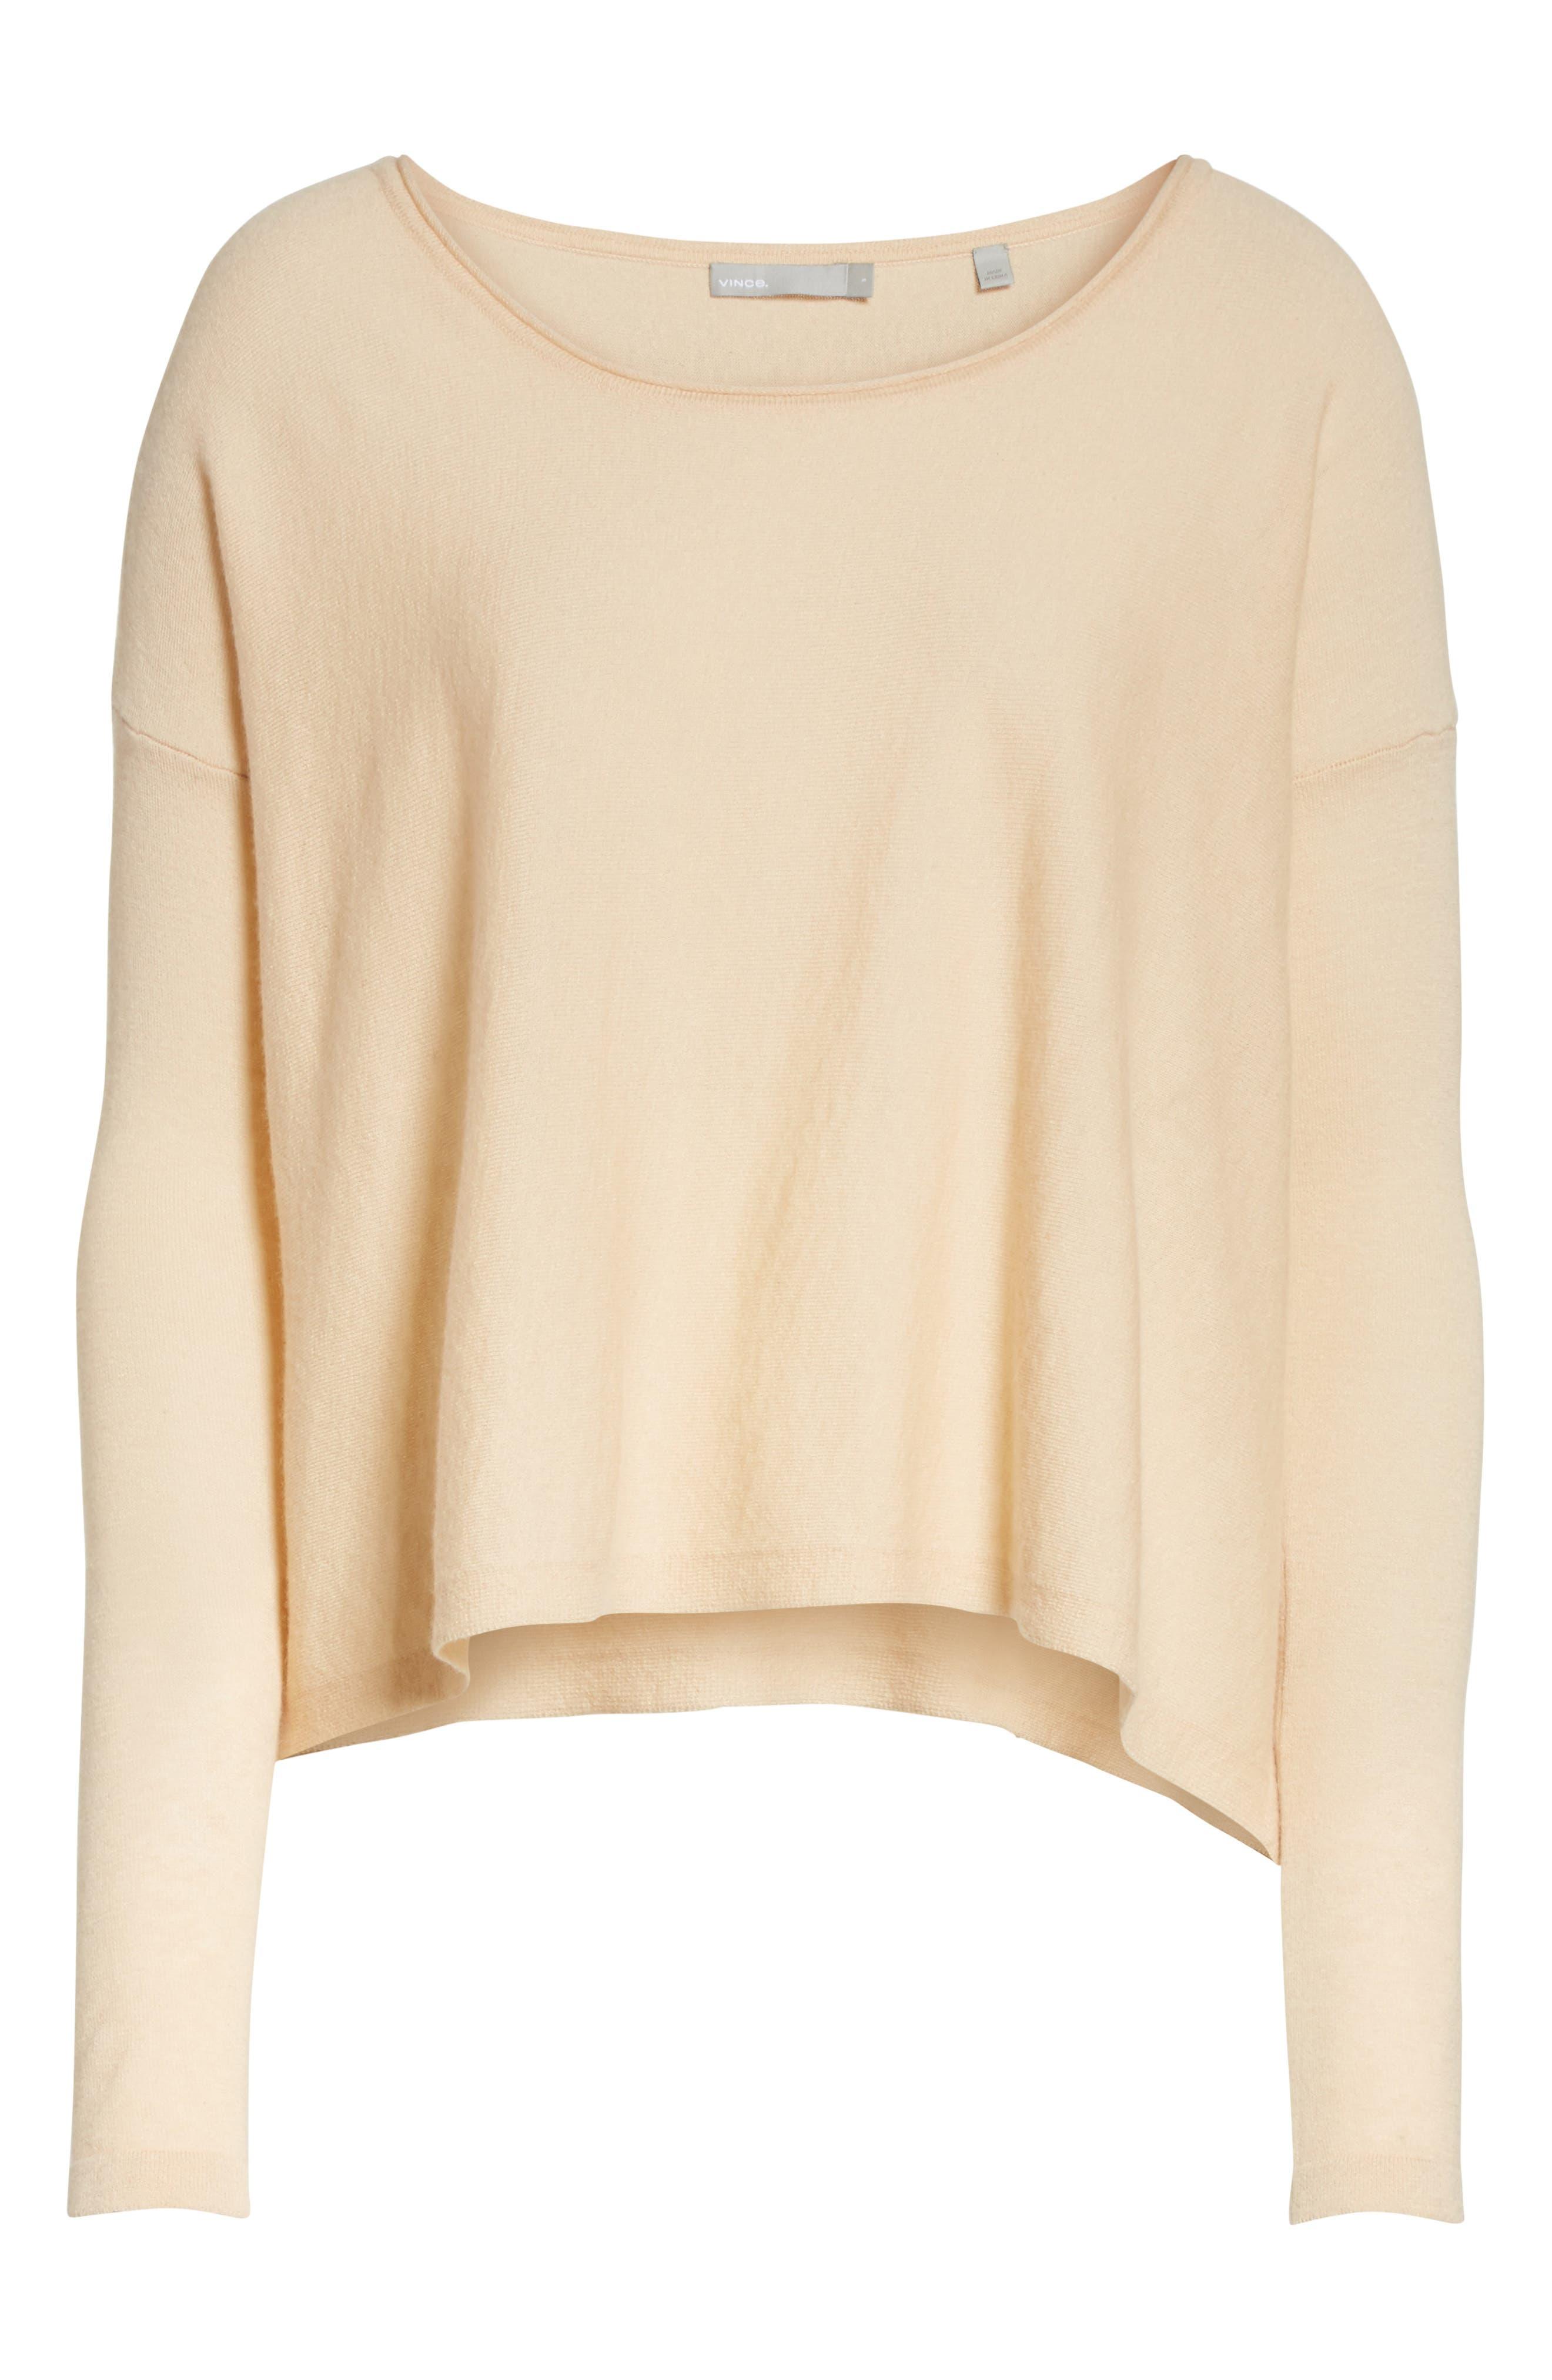 VINCE,                             Cinched Back Cashmere Sweater,                             Alternate thumbnail 6, color,                             298